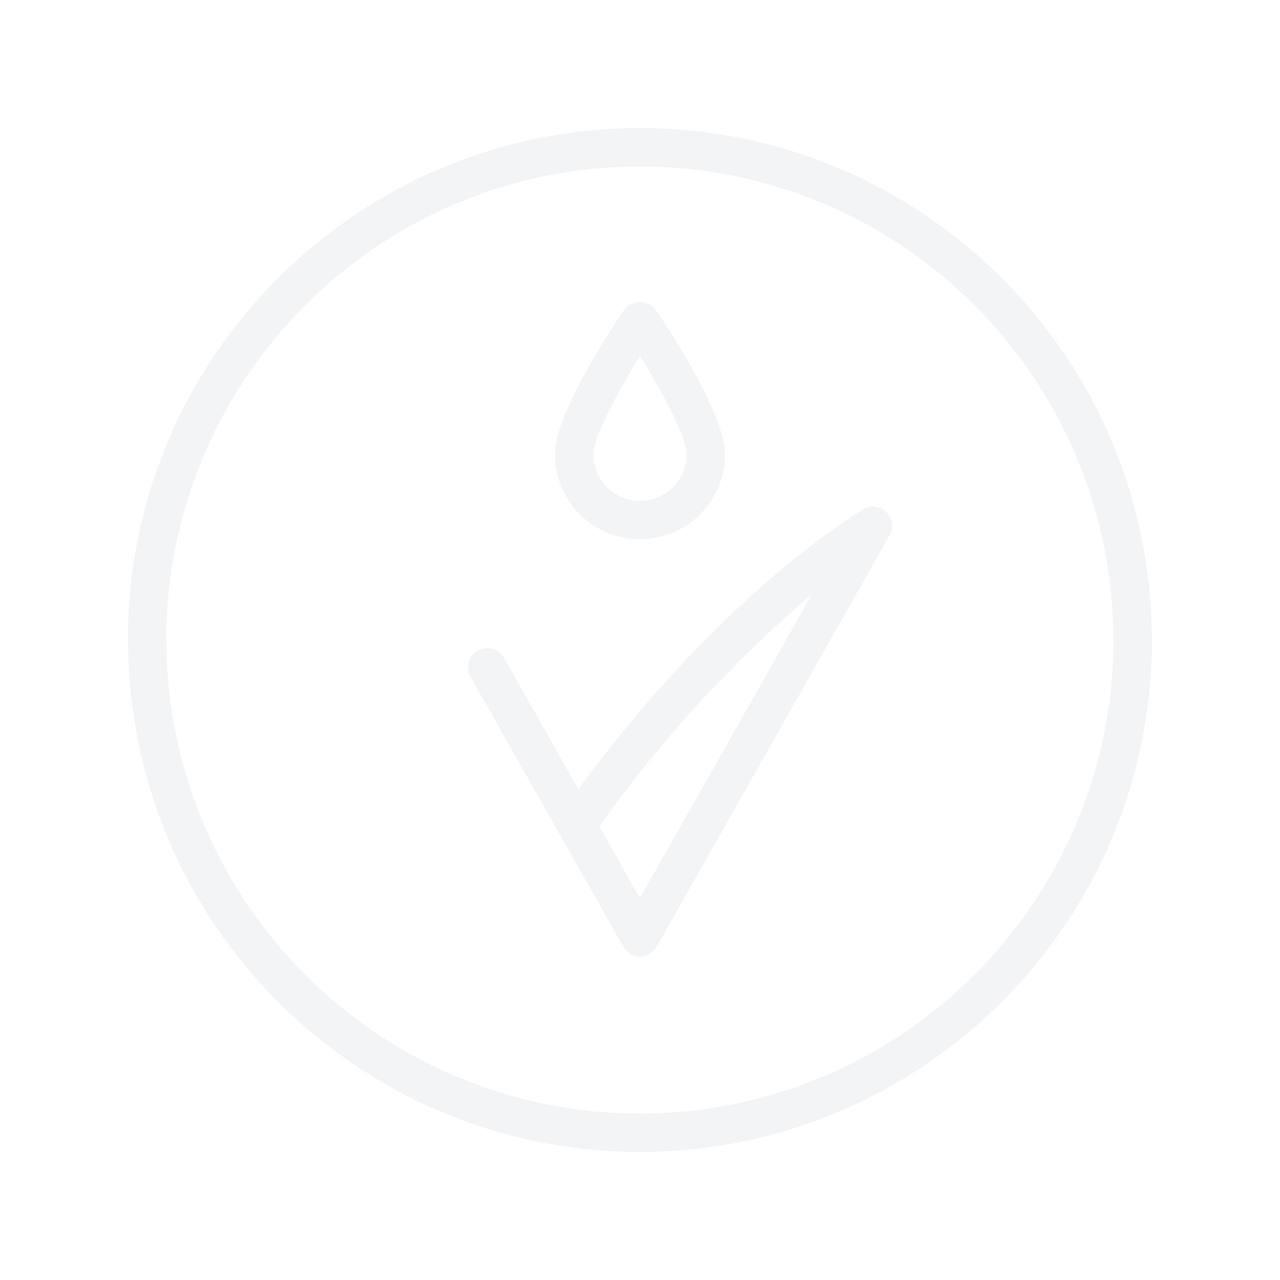 HOLIKA HOLIKA Biotin Damage Care Oil Mist масляный мист с биотином для поврежденных волос 120ml